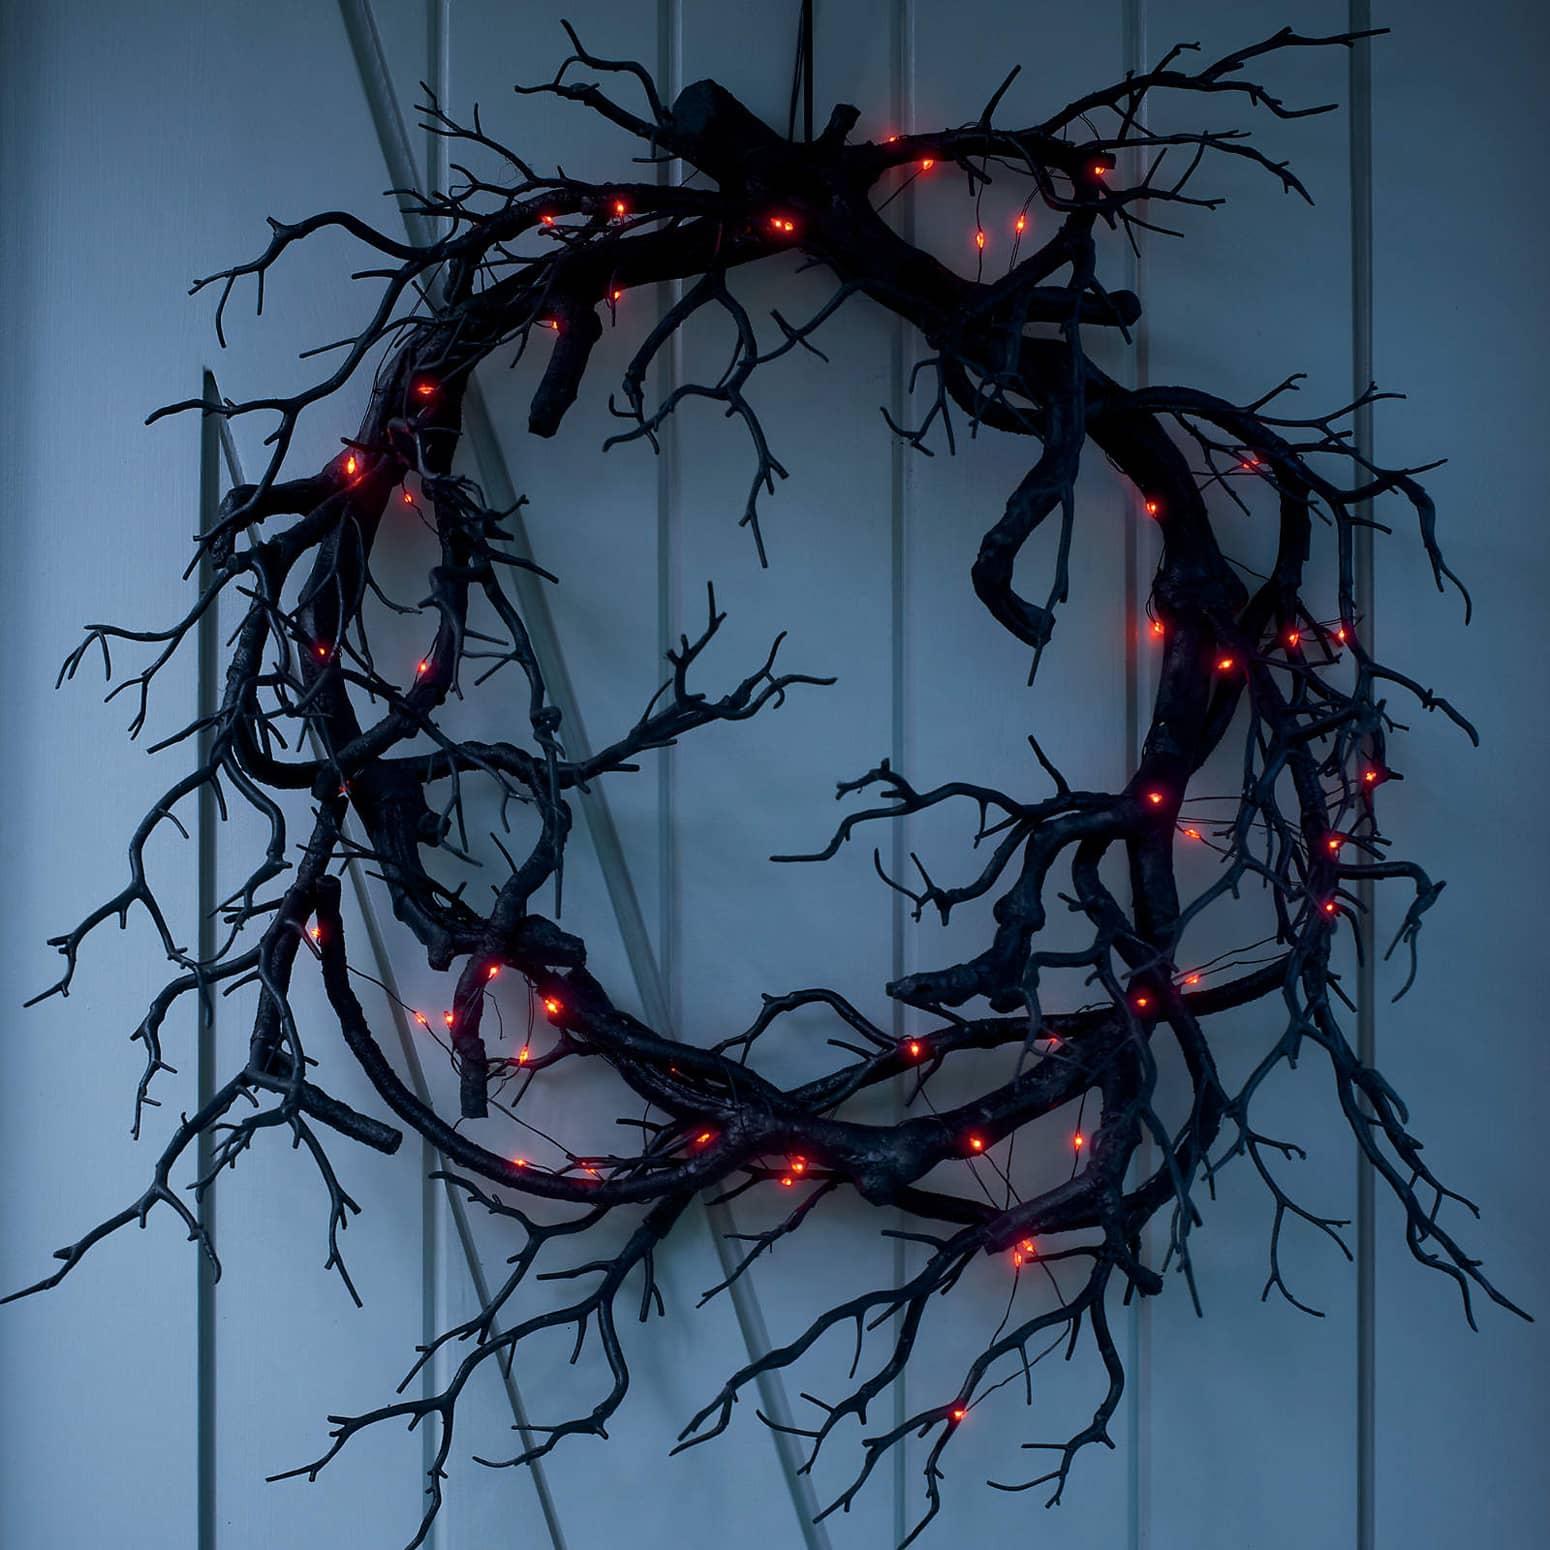 Creepy Black Branch Wreath The Green Head